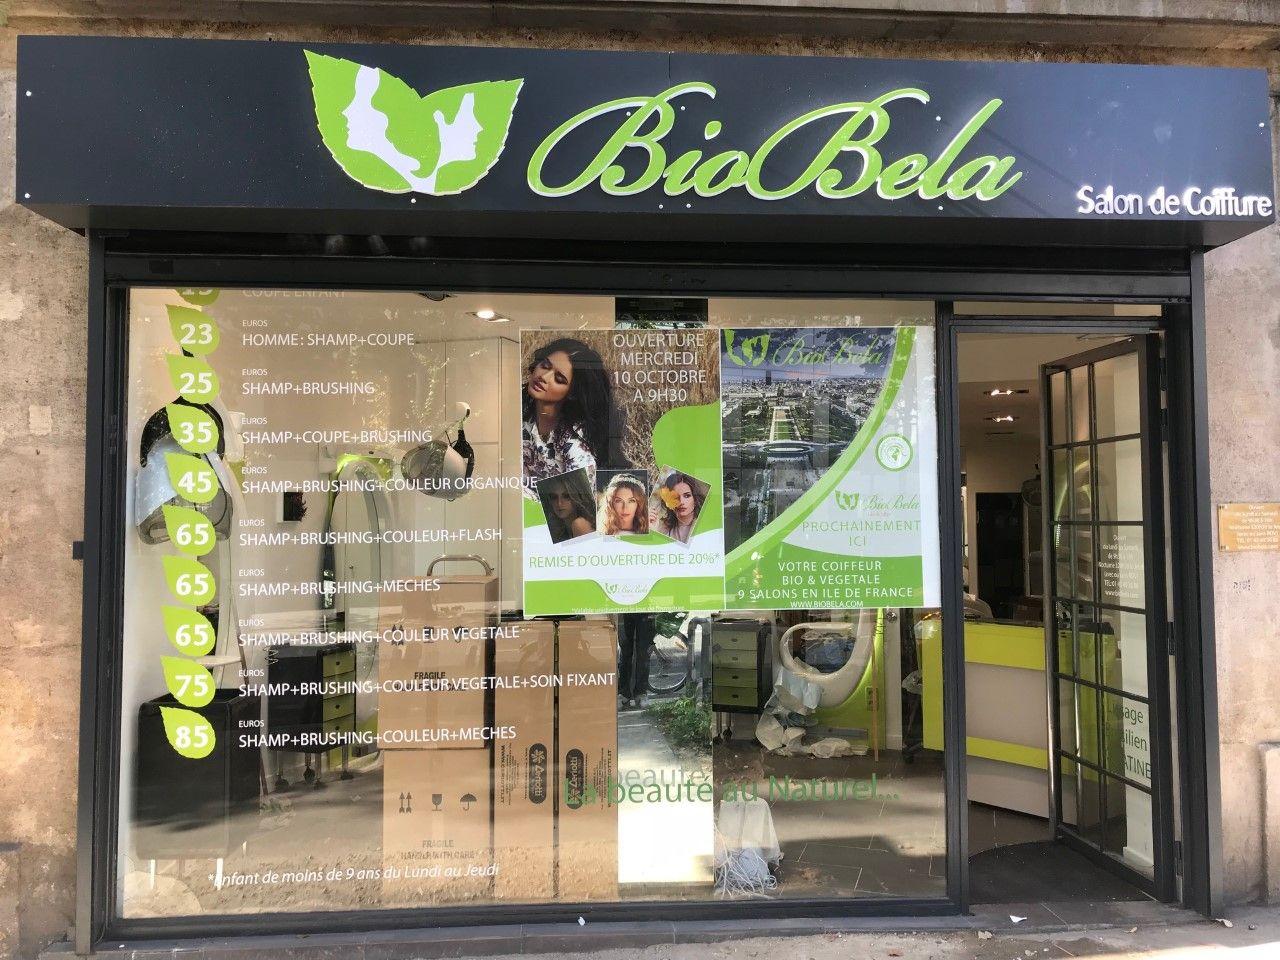 44+ Salon de coiffure vegetal idees en 2021